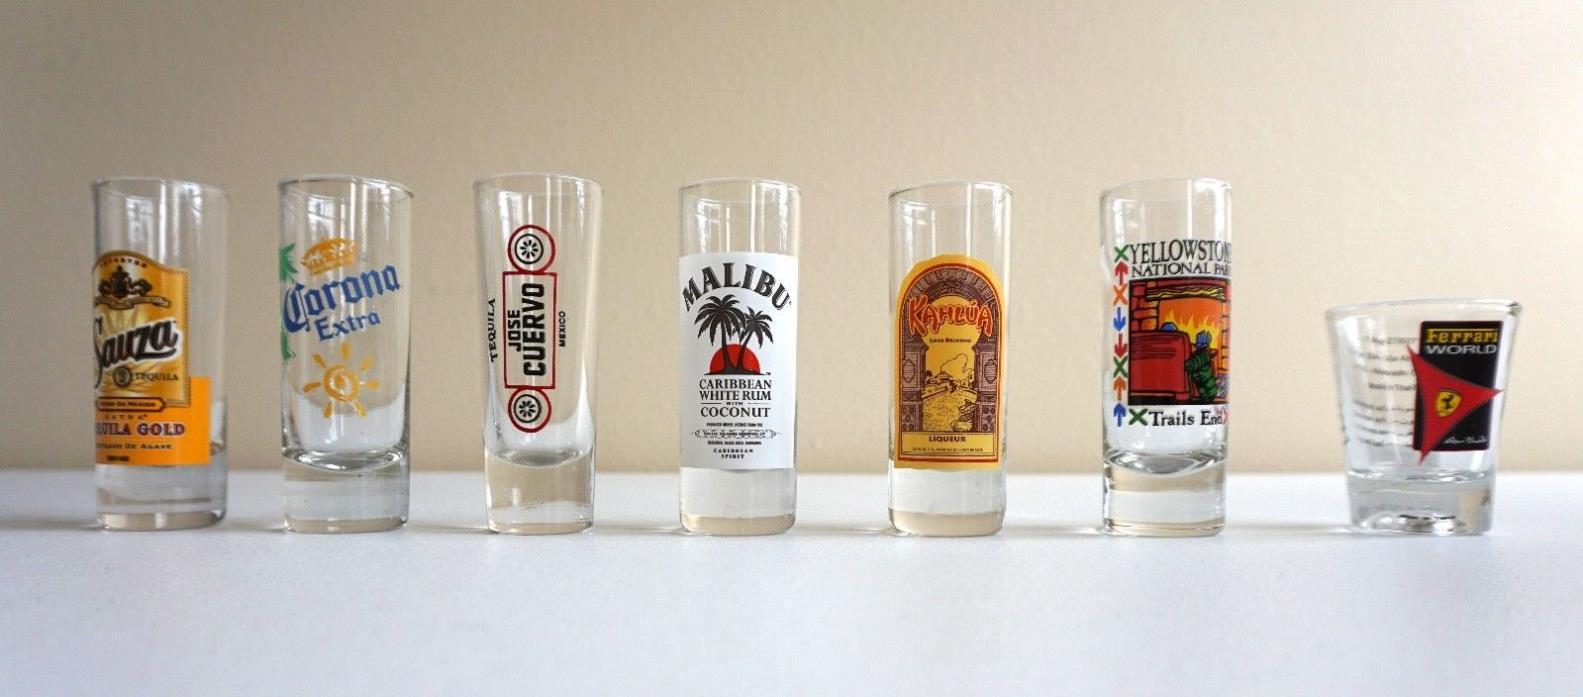 Lot of Shot Glasses - Ferrari, Sauza, Kailua, Corona, Jose Cuervo, Malibu